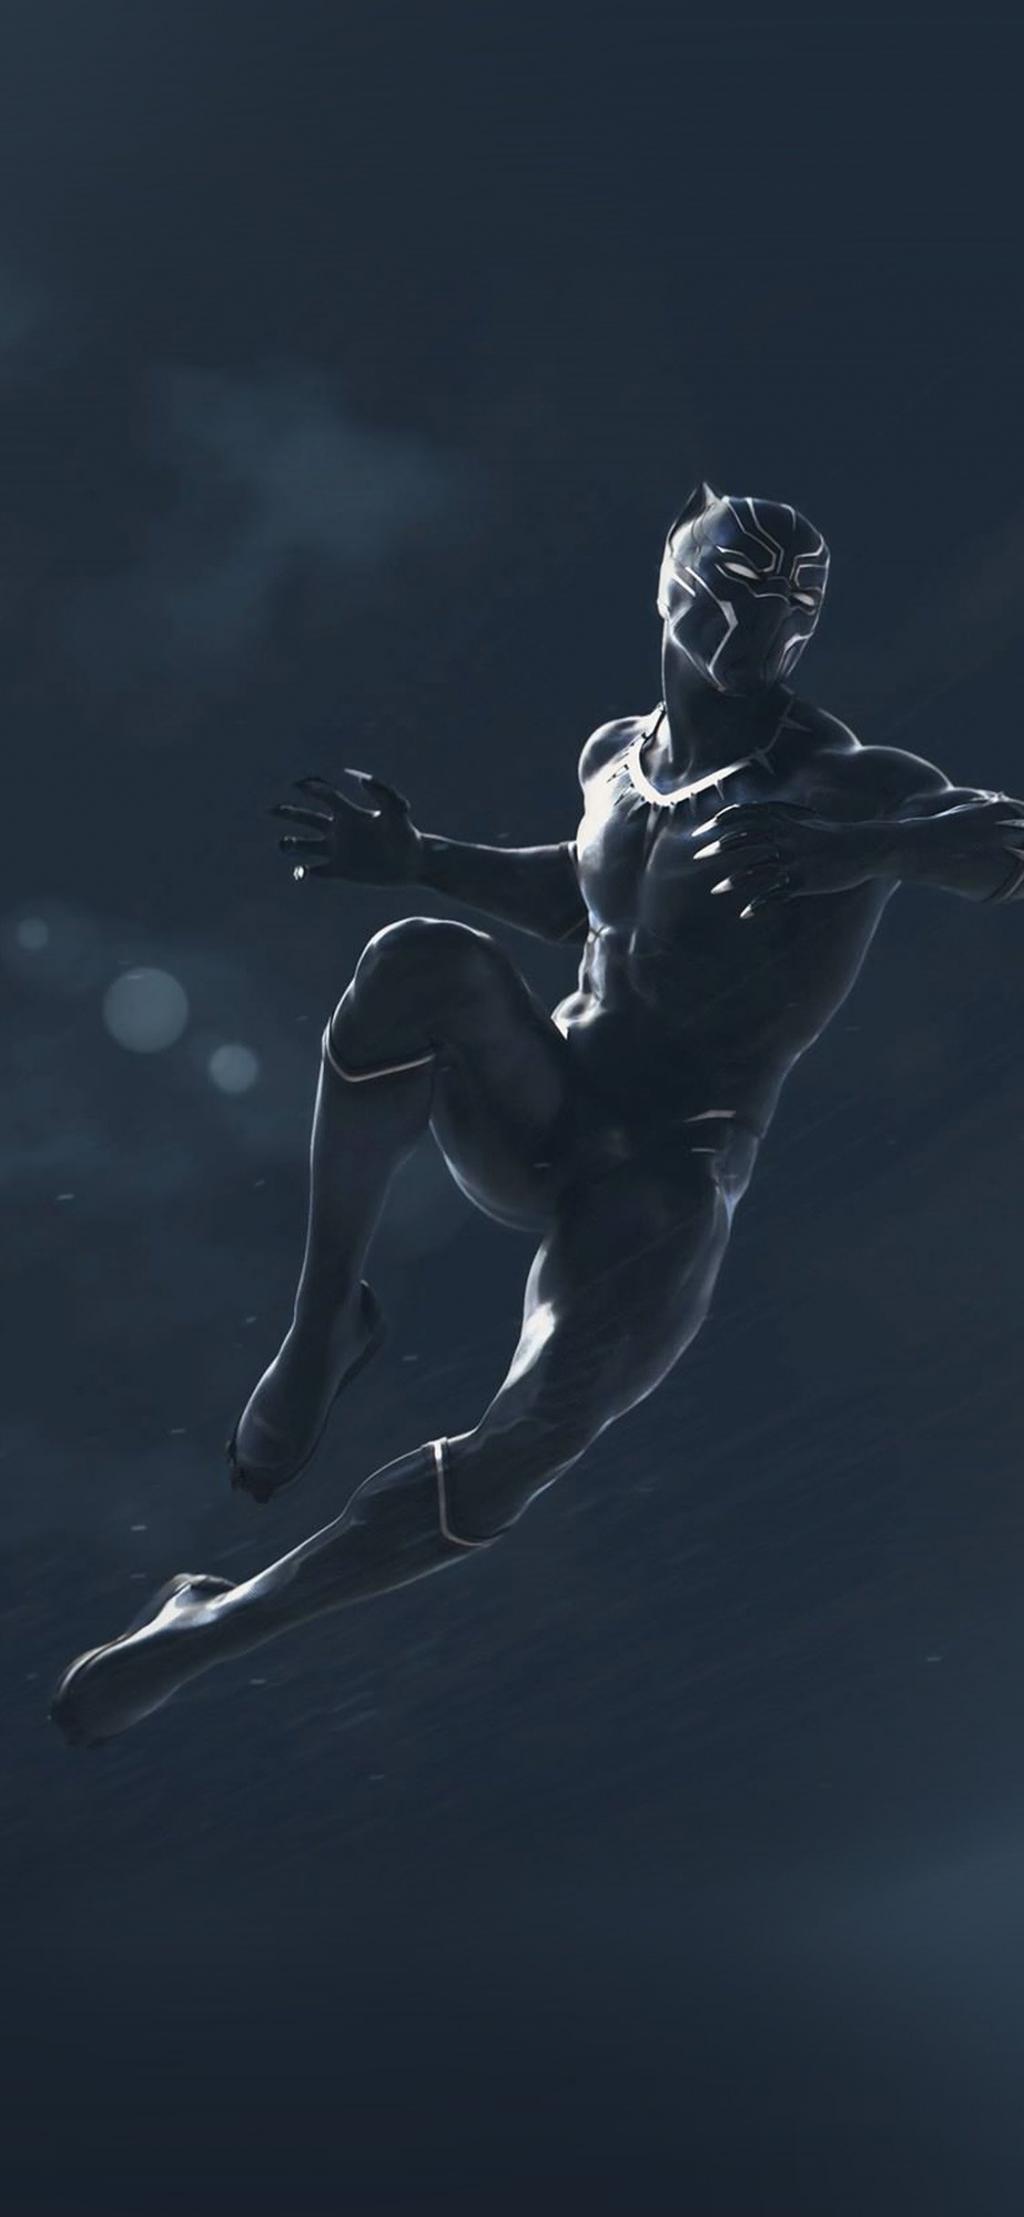 blackpanther marvel comics jump wakanda night dark